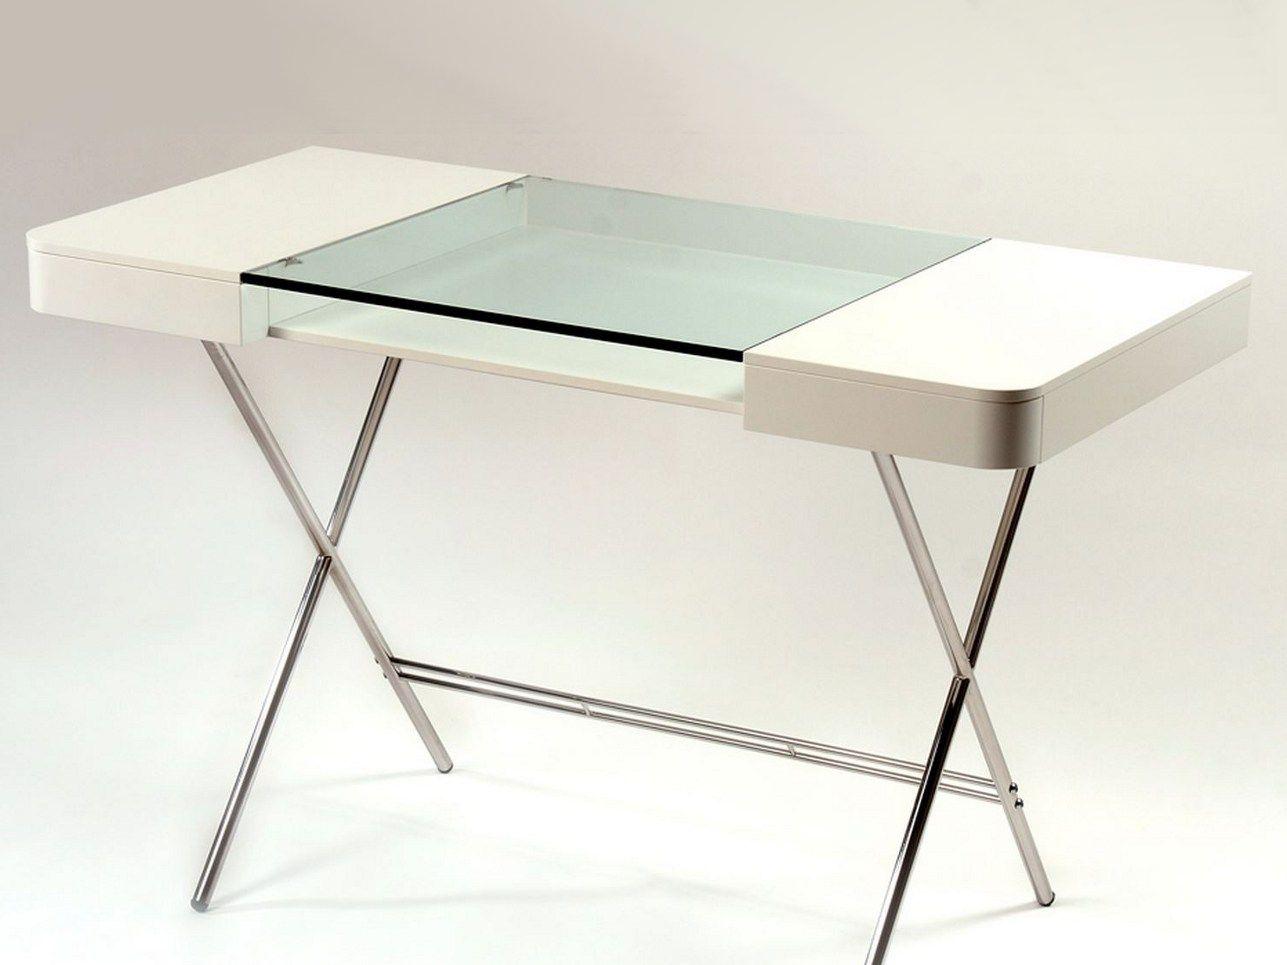 Bureau en mdf et verre avec tiroirs cosimo laqu blanc mat - Bureau en verre blanc ...